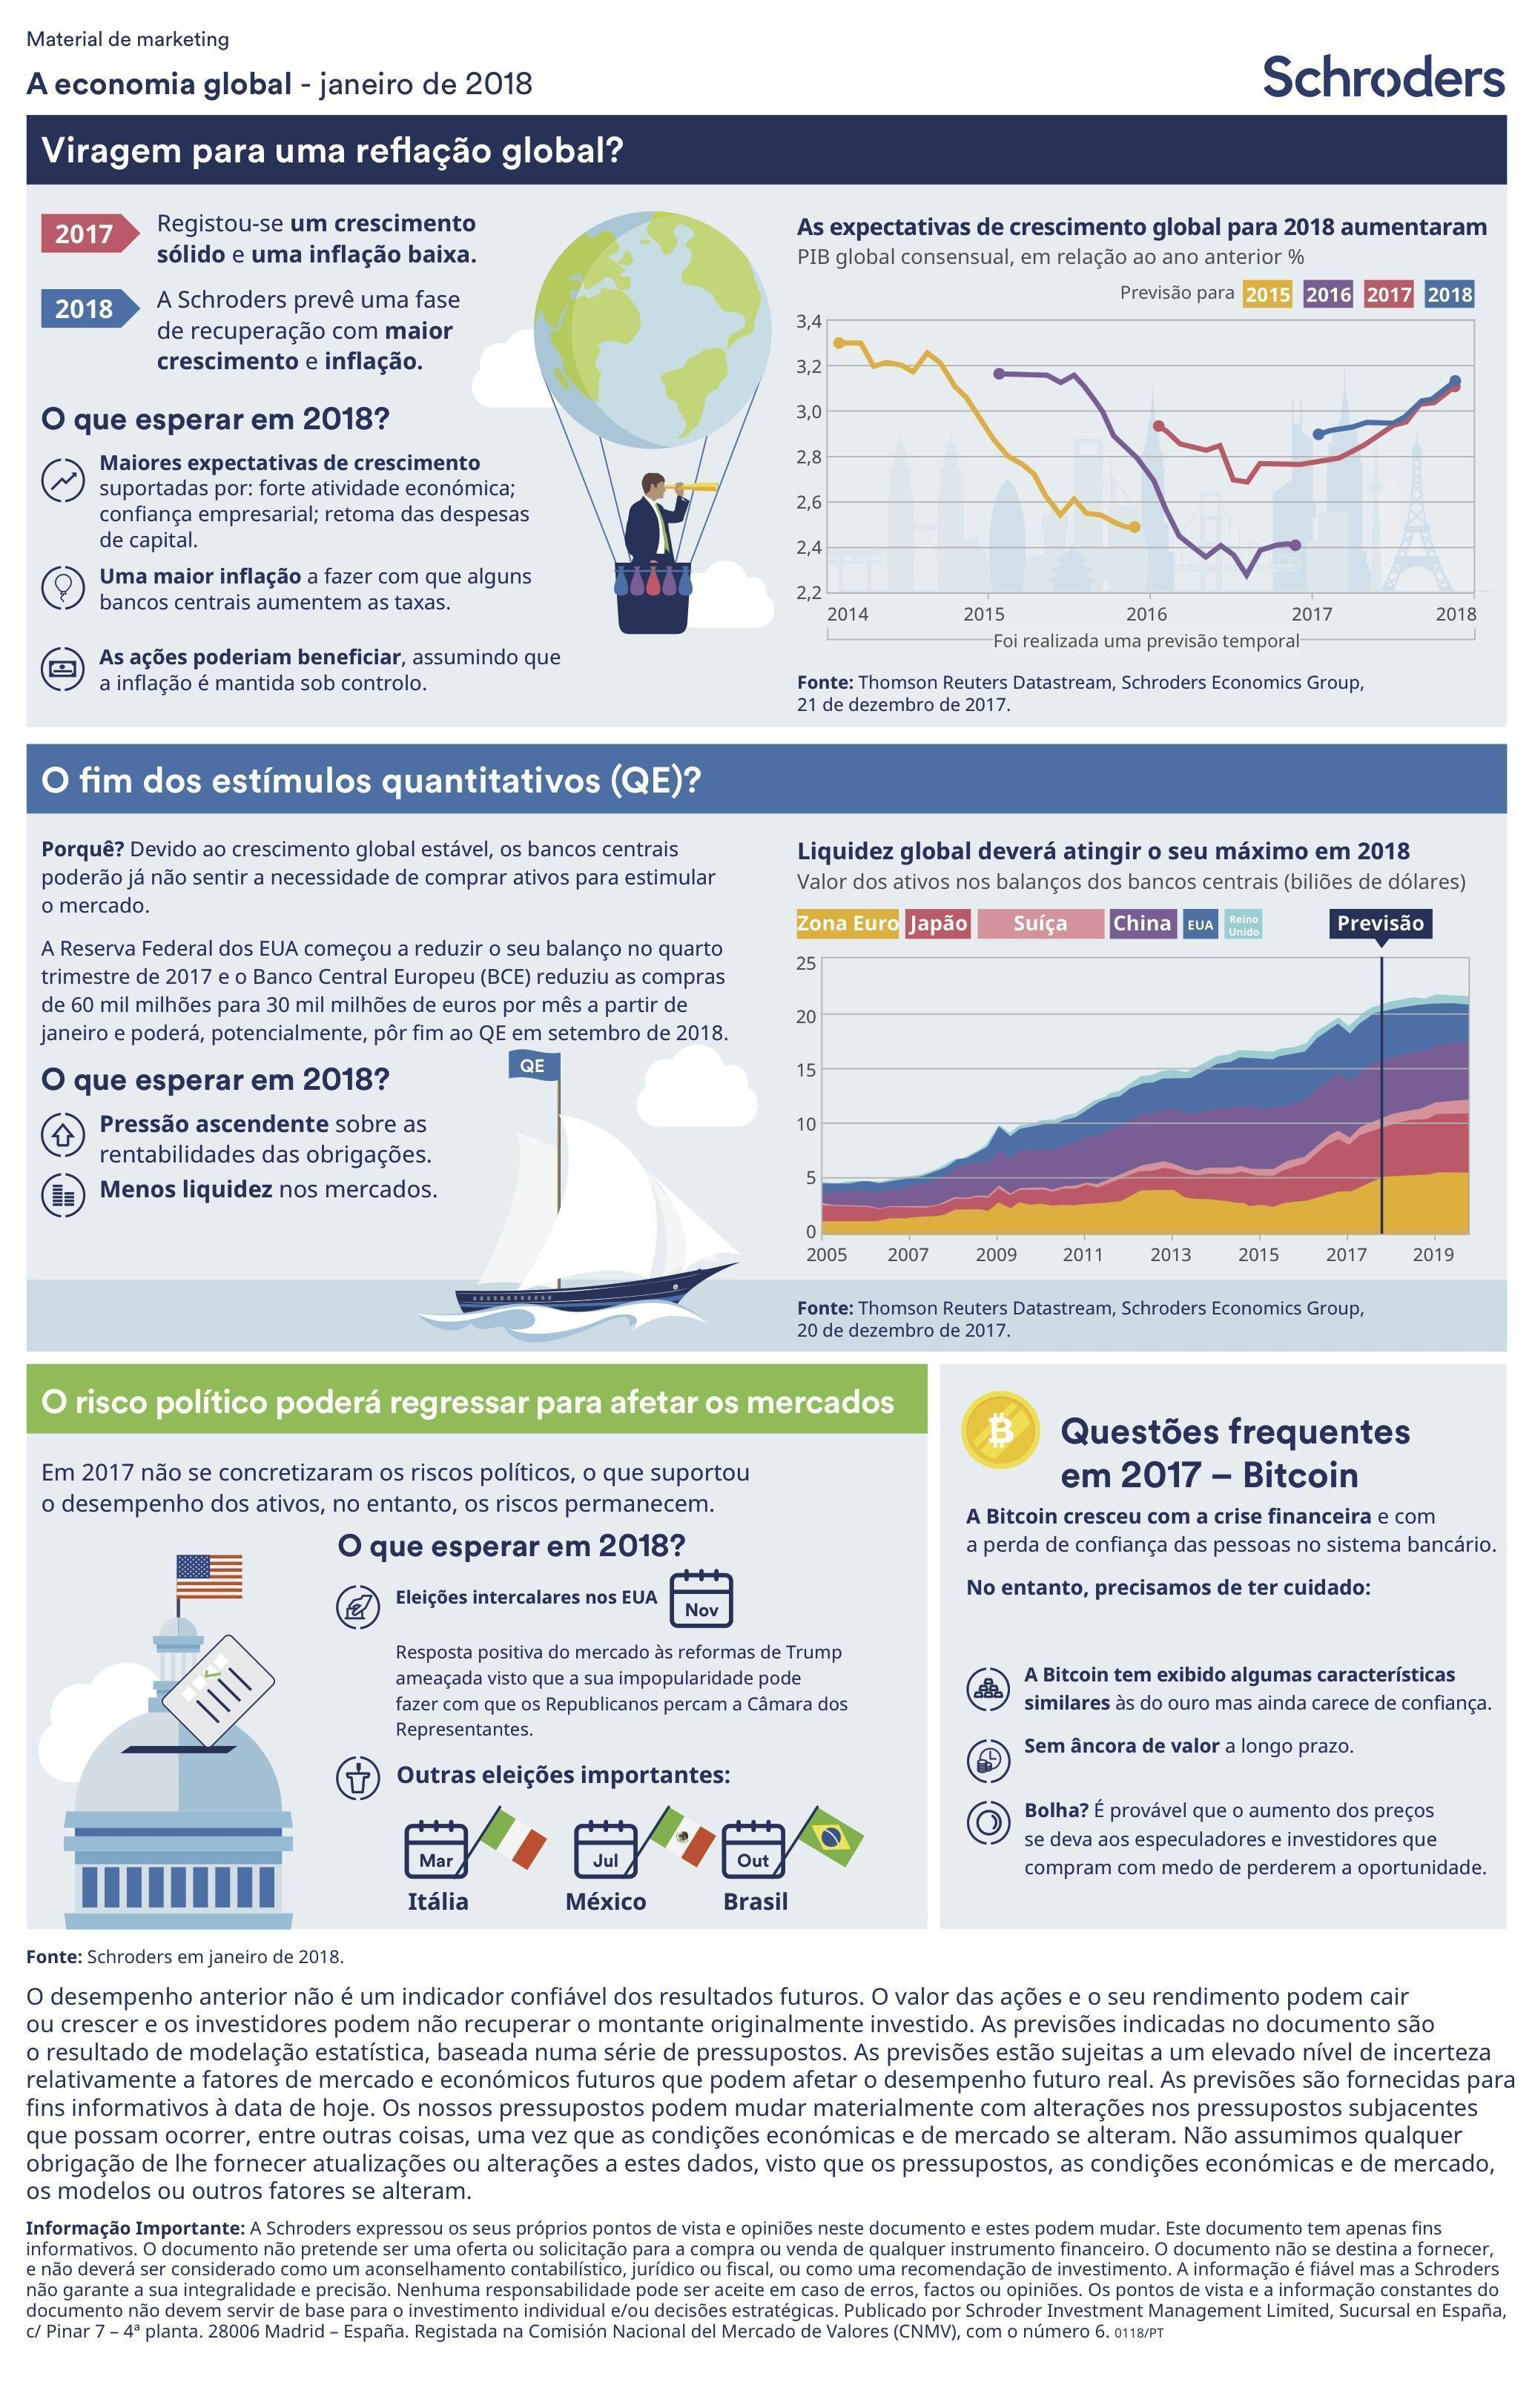 schroders-economic-infographic-ptpt